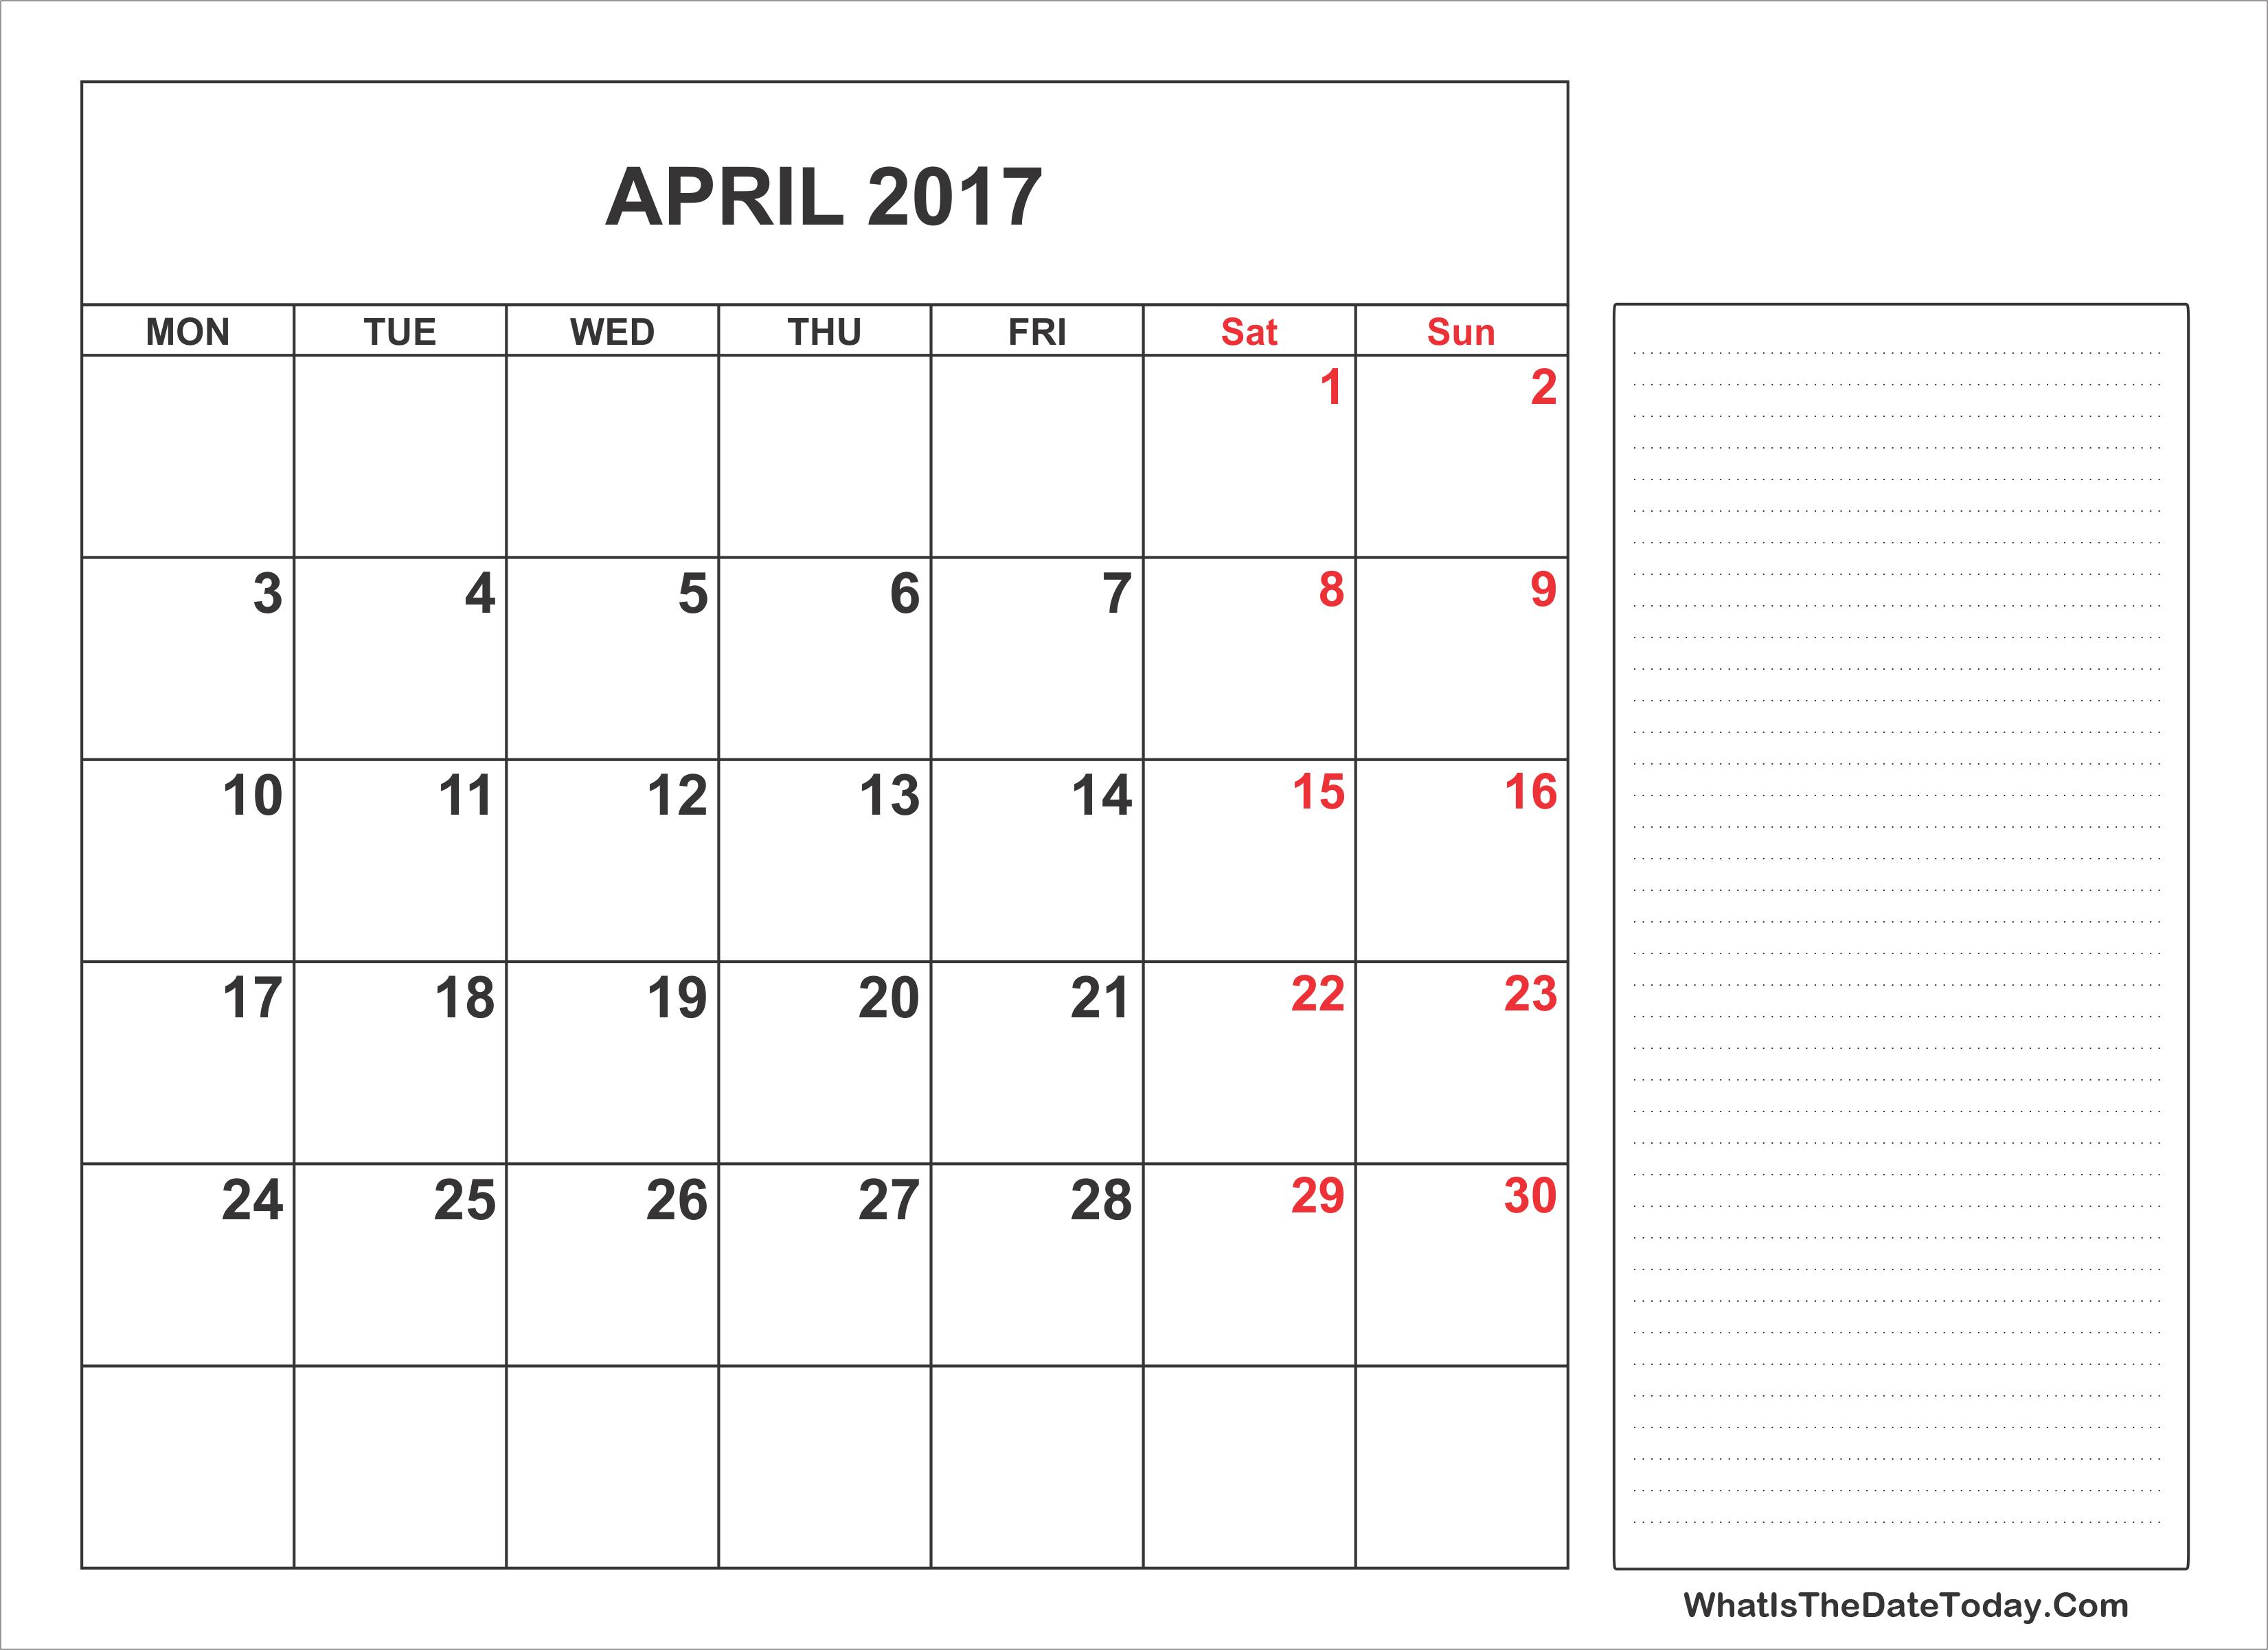 April Calendar Notes : Printable april calendar with notes